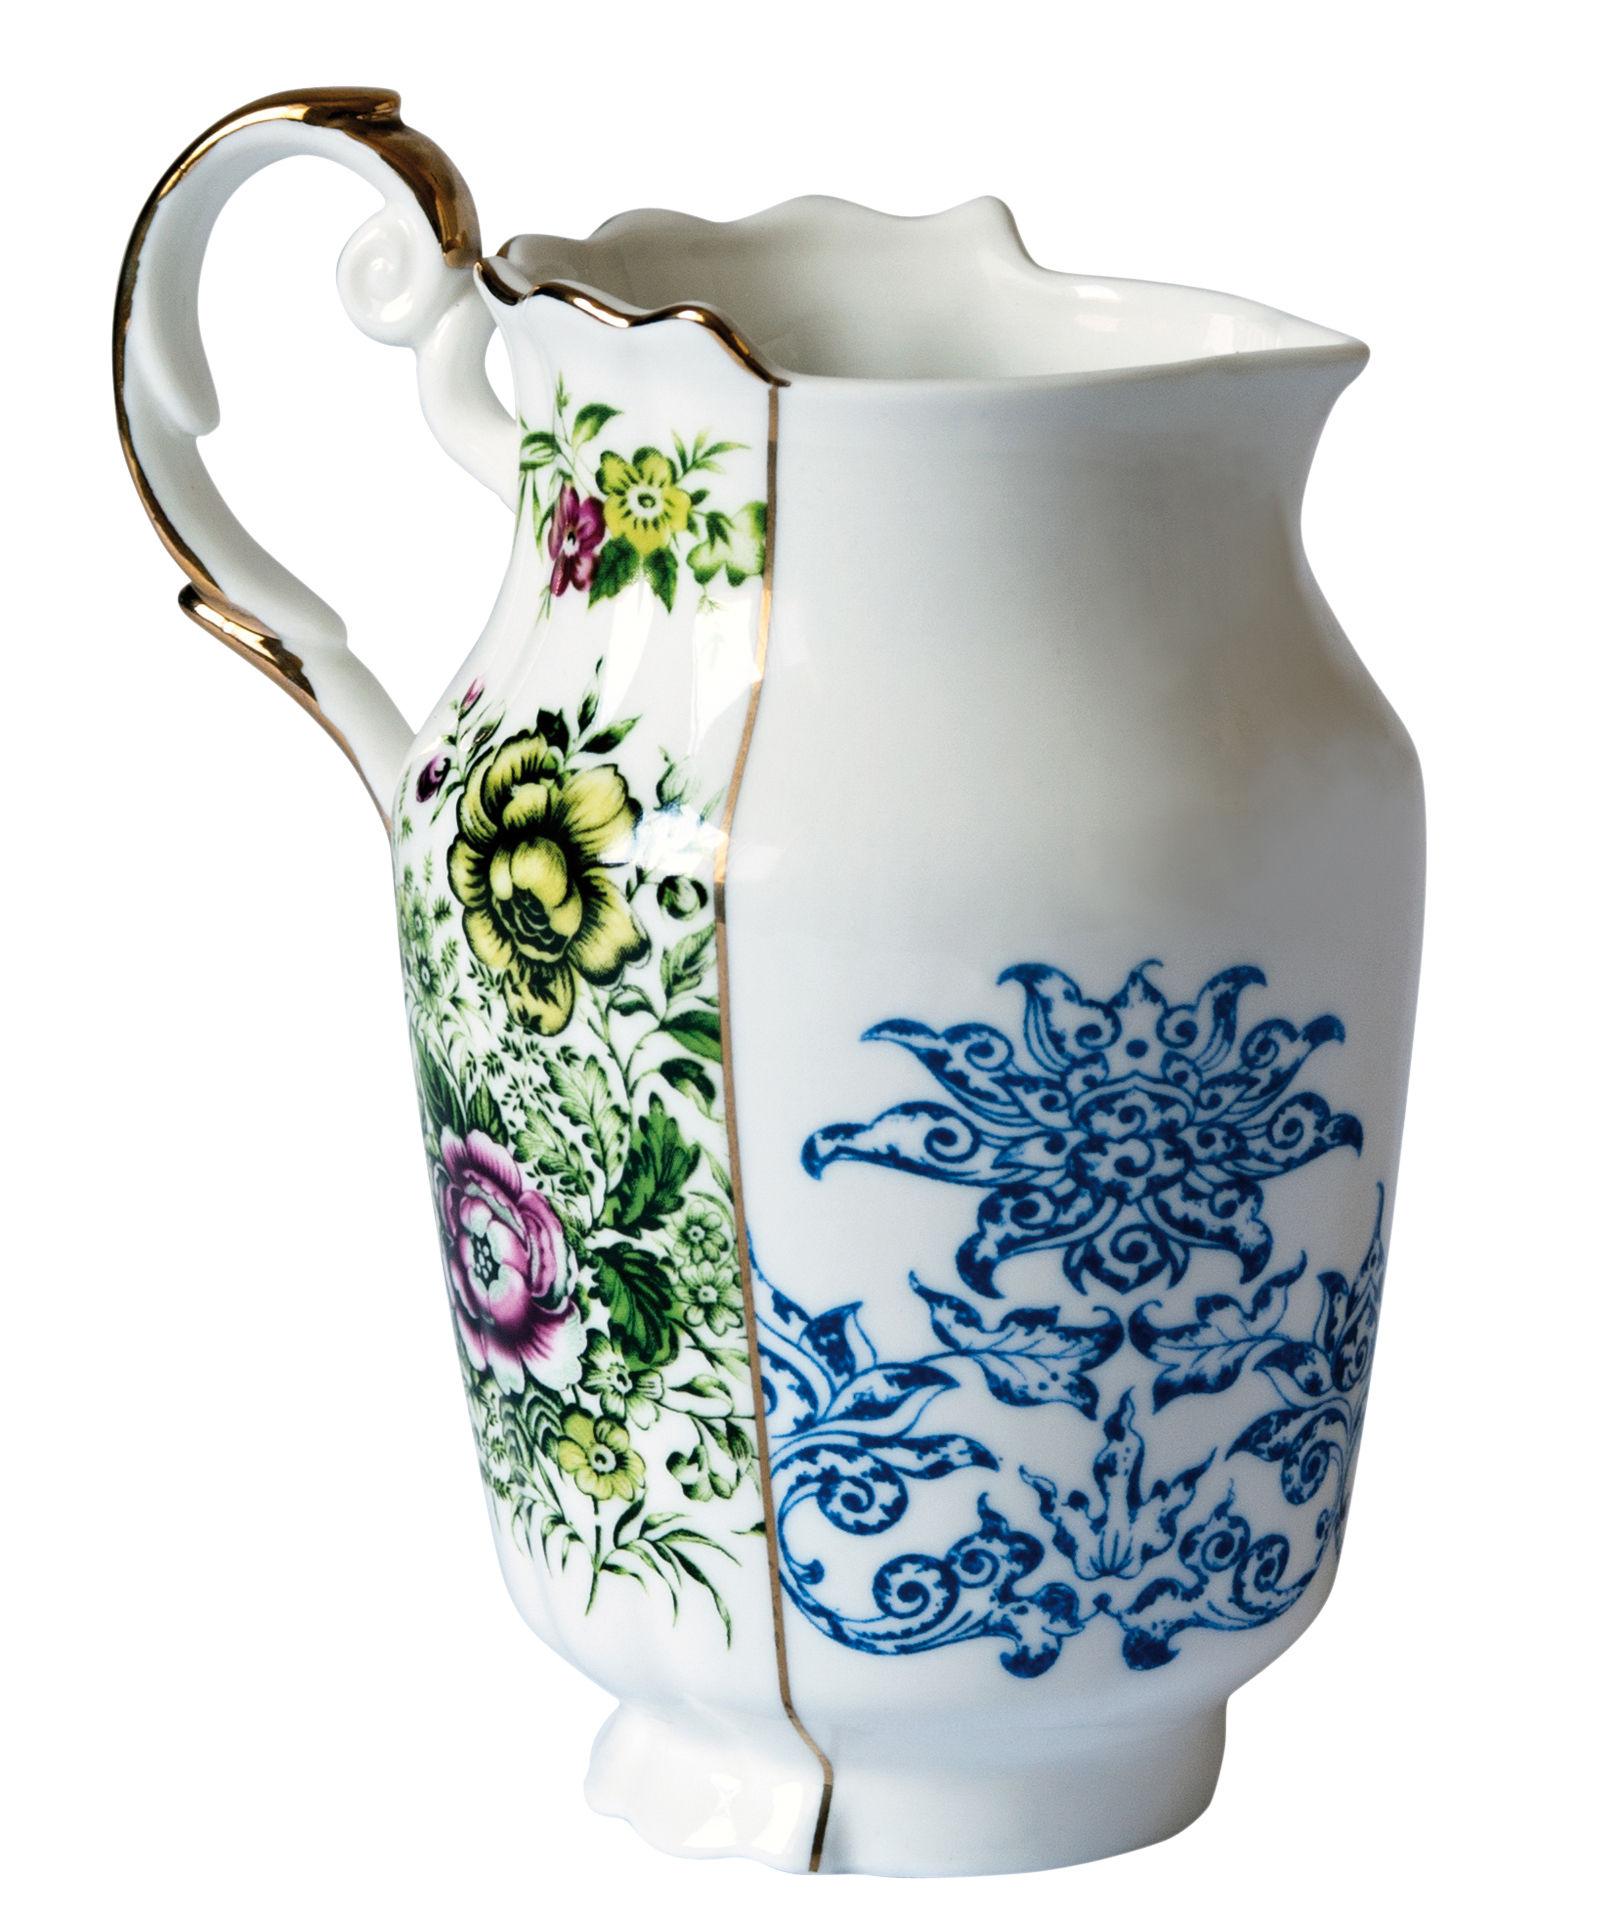 Tableware - Tea & Coffee Accessories - Hybrid - Berenice Milk pot by Seletti - Berenice - China